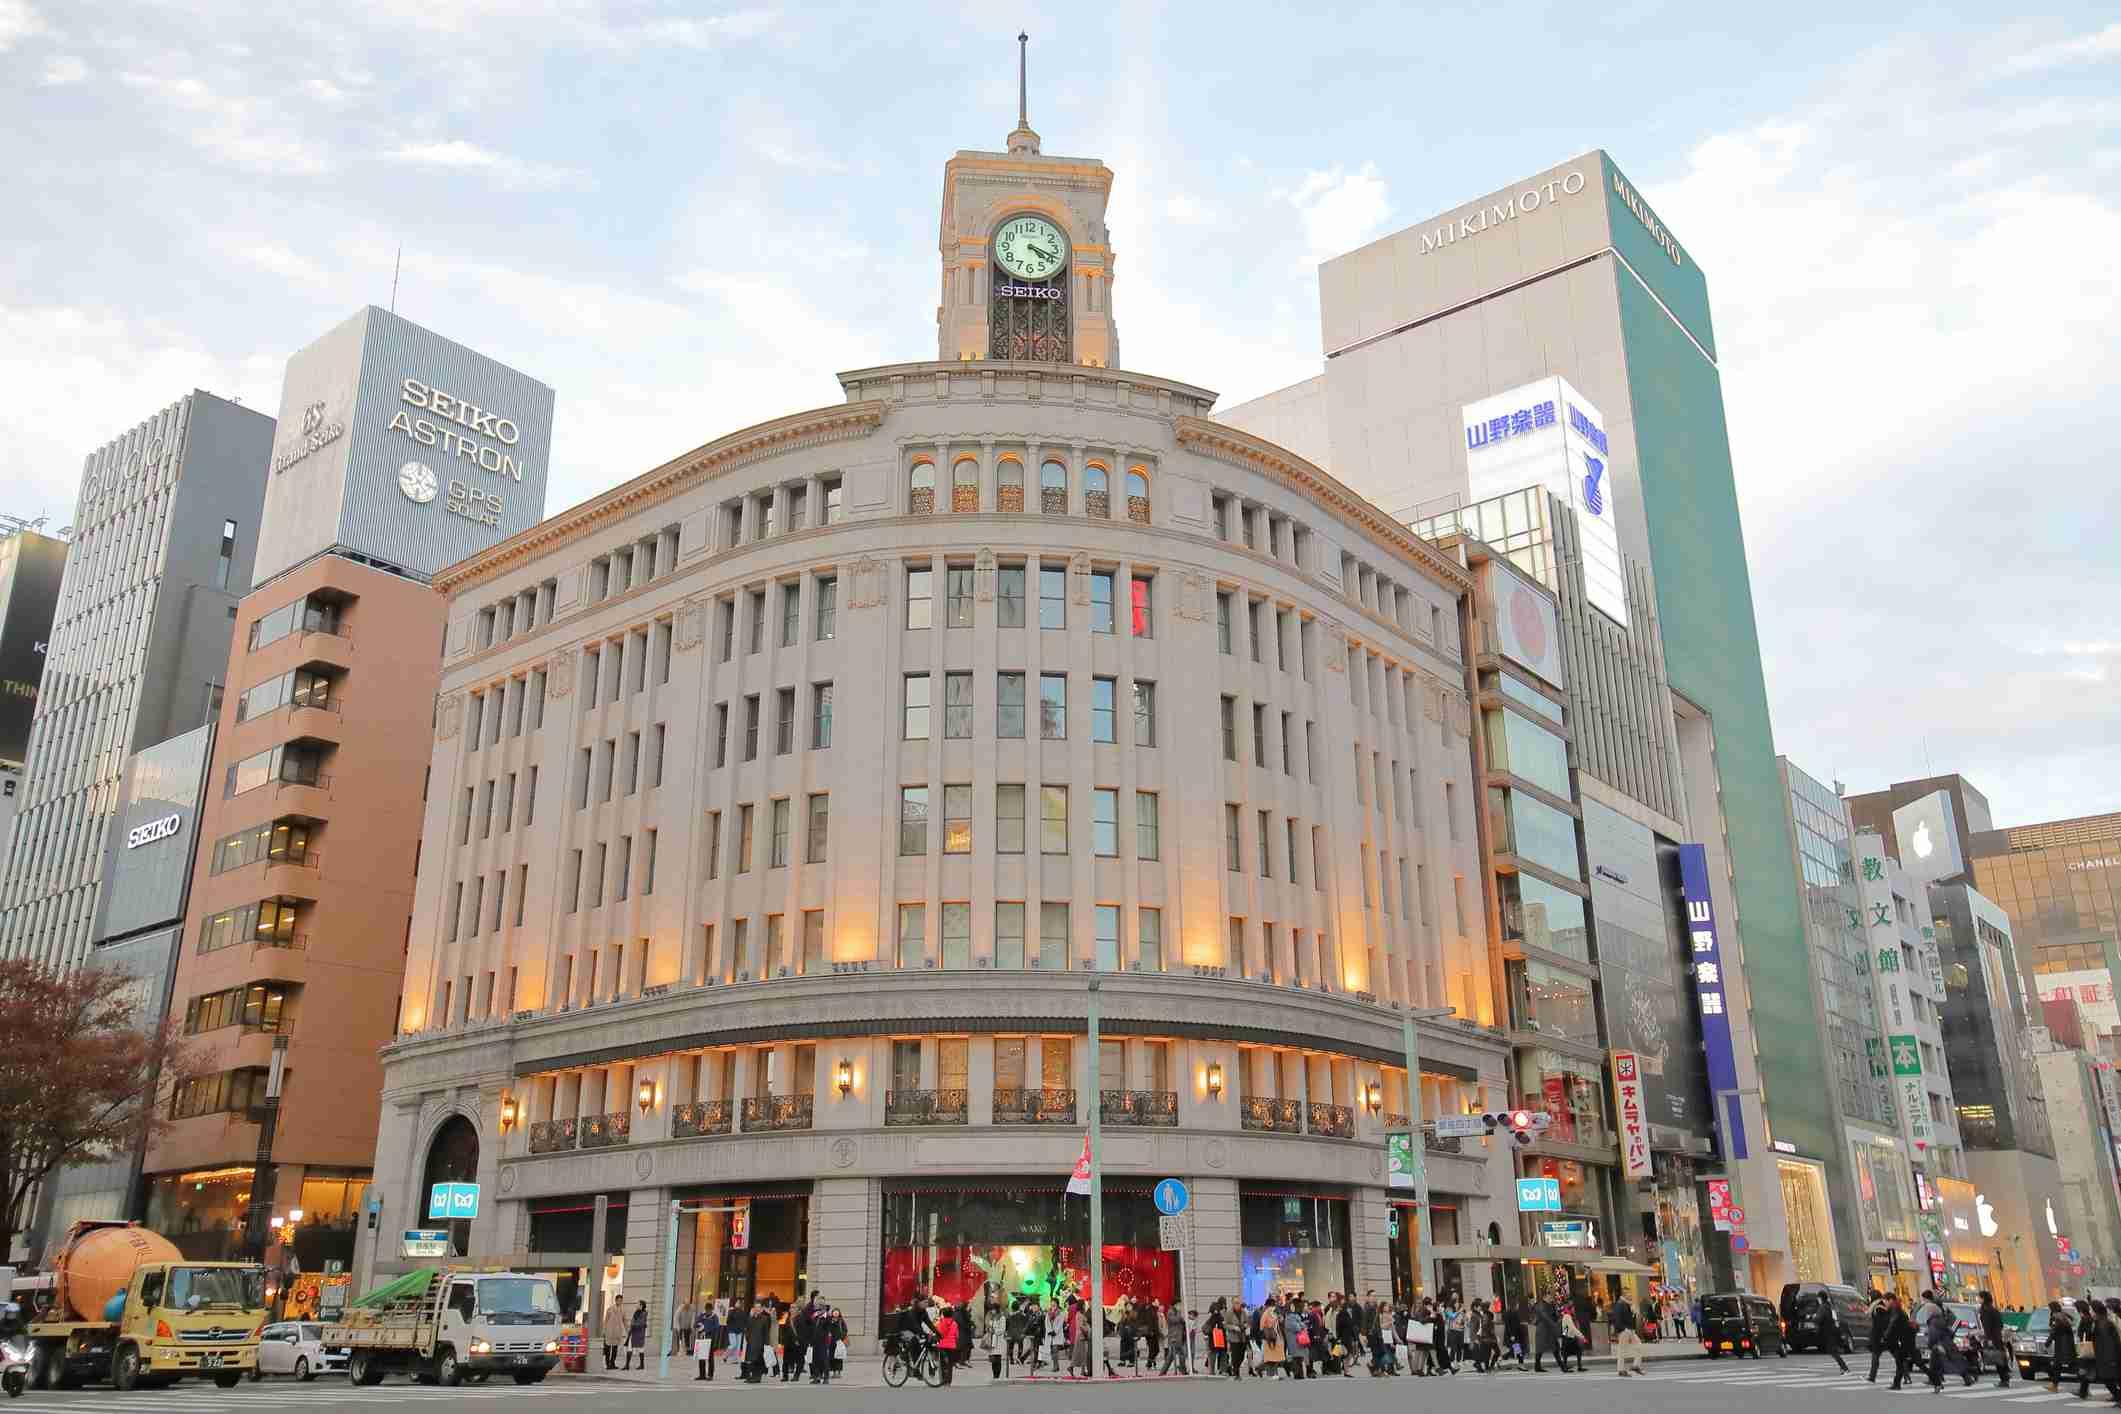 Historical Wako building Ginza Tokyo Japan